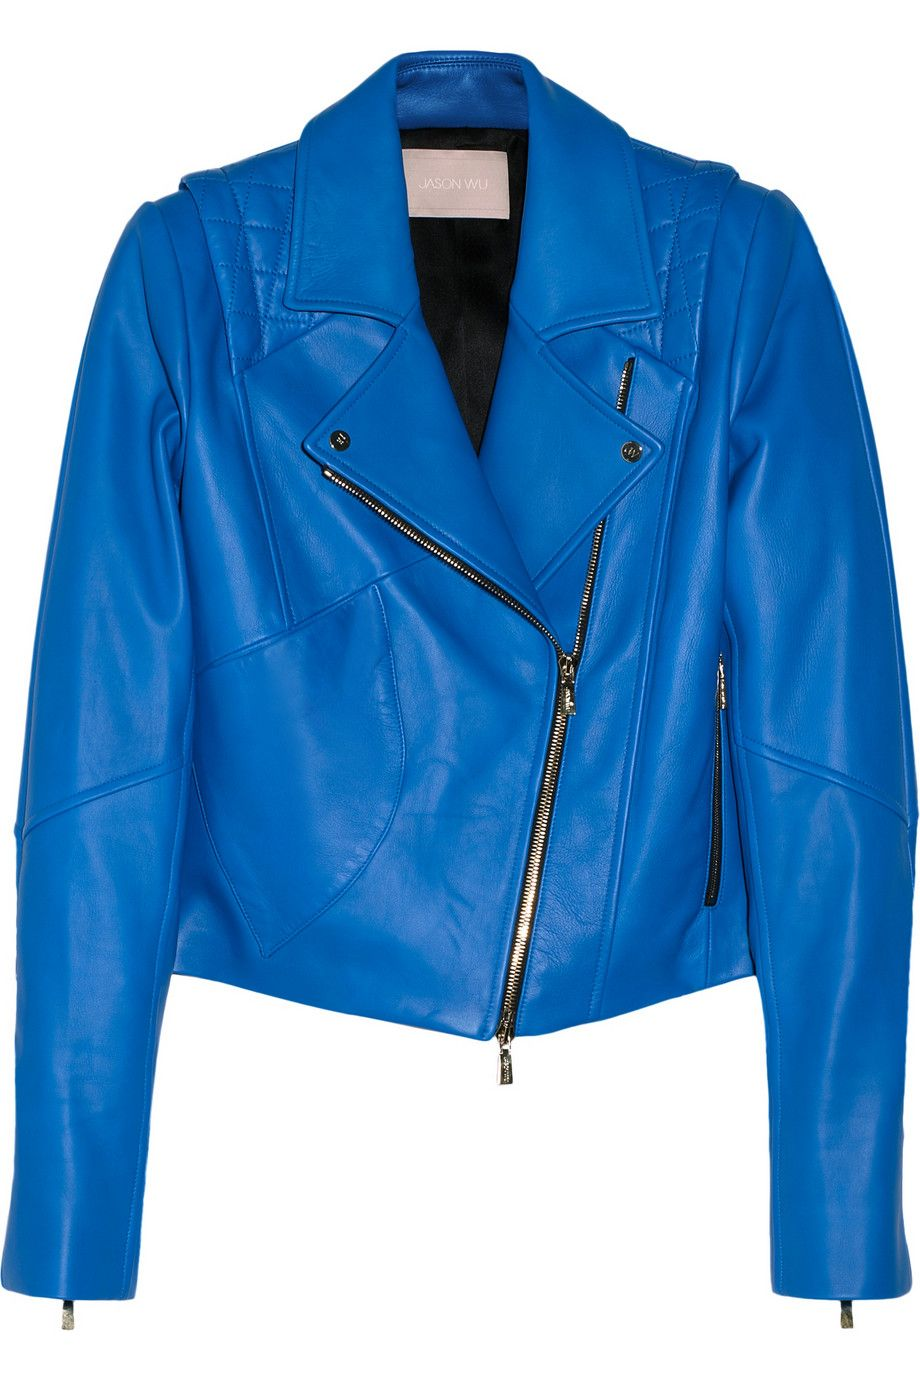 Bright Blue Leather Biker Jacket Jason Wu Collection Blue Leather Jacket Leather Jacket Biker Jacket Style [ 1380 x 920 Pixel ]